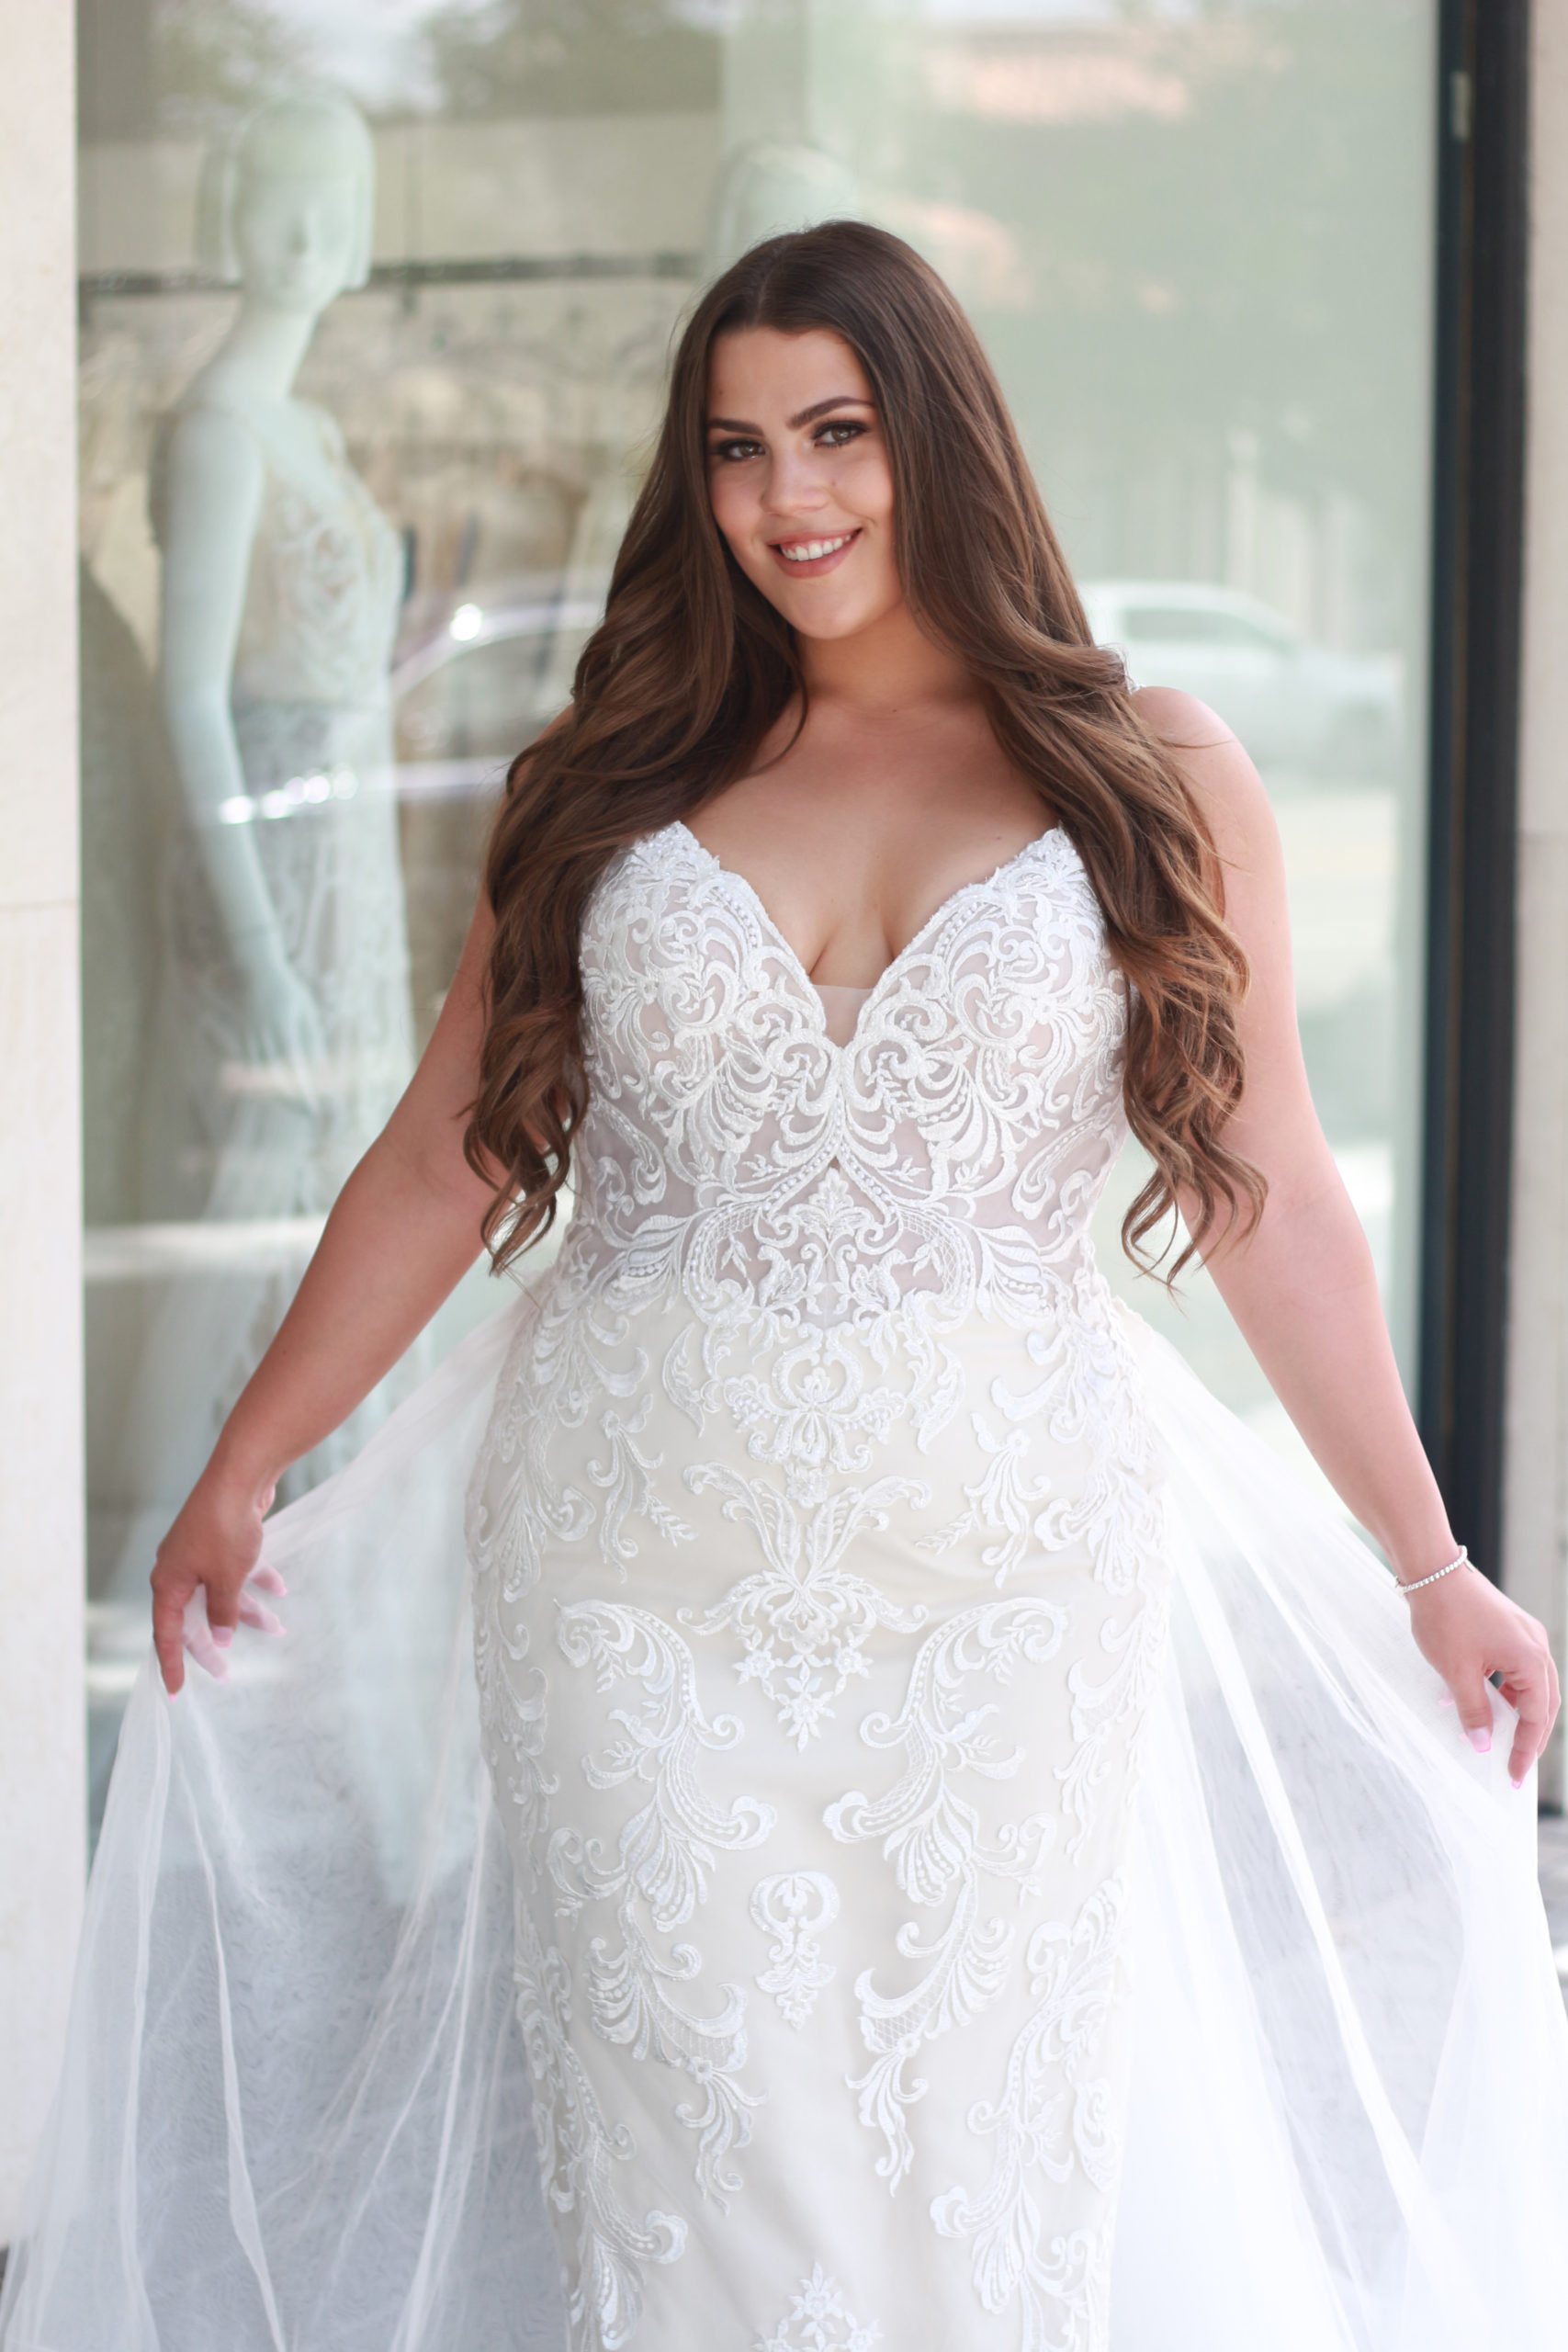 Merlili Bridal Boutique Bridal Shop In Coral Gables